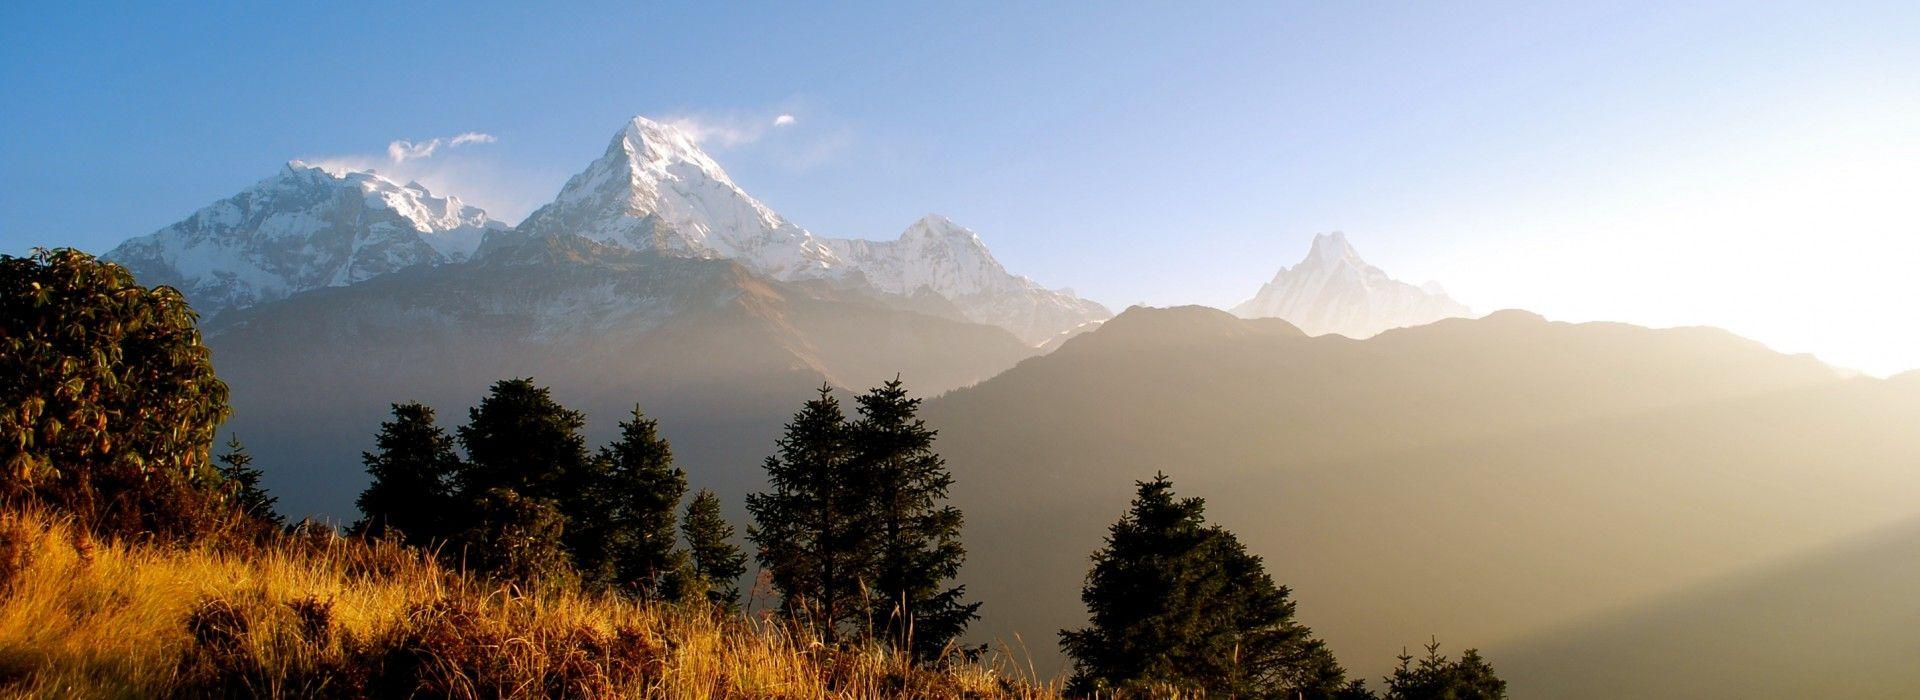 Luxury Tours in Nepal